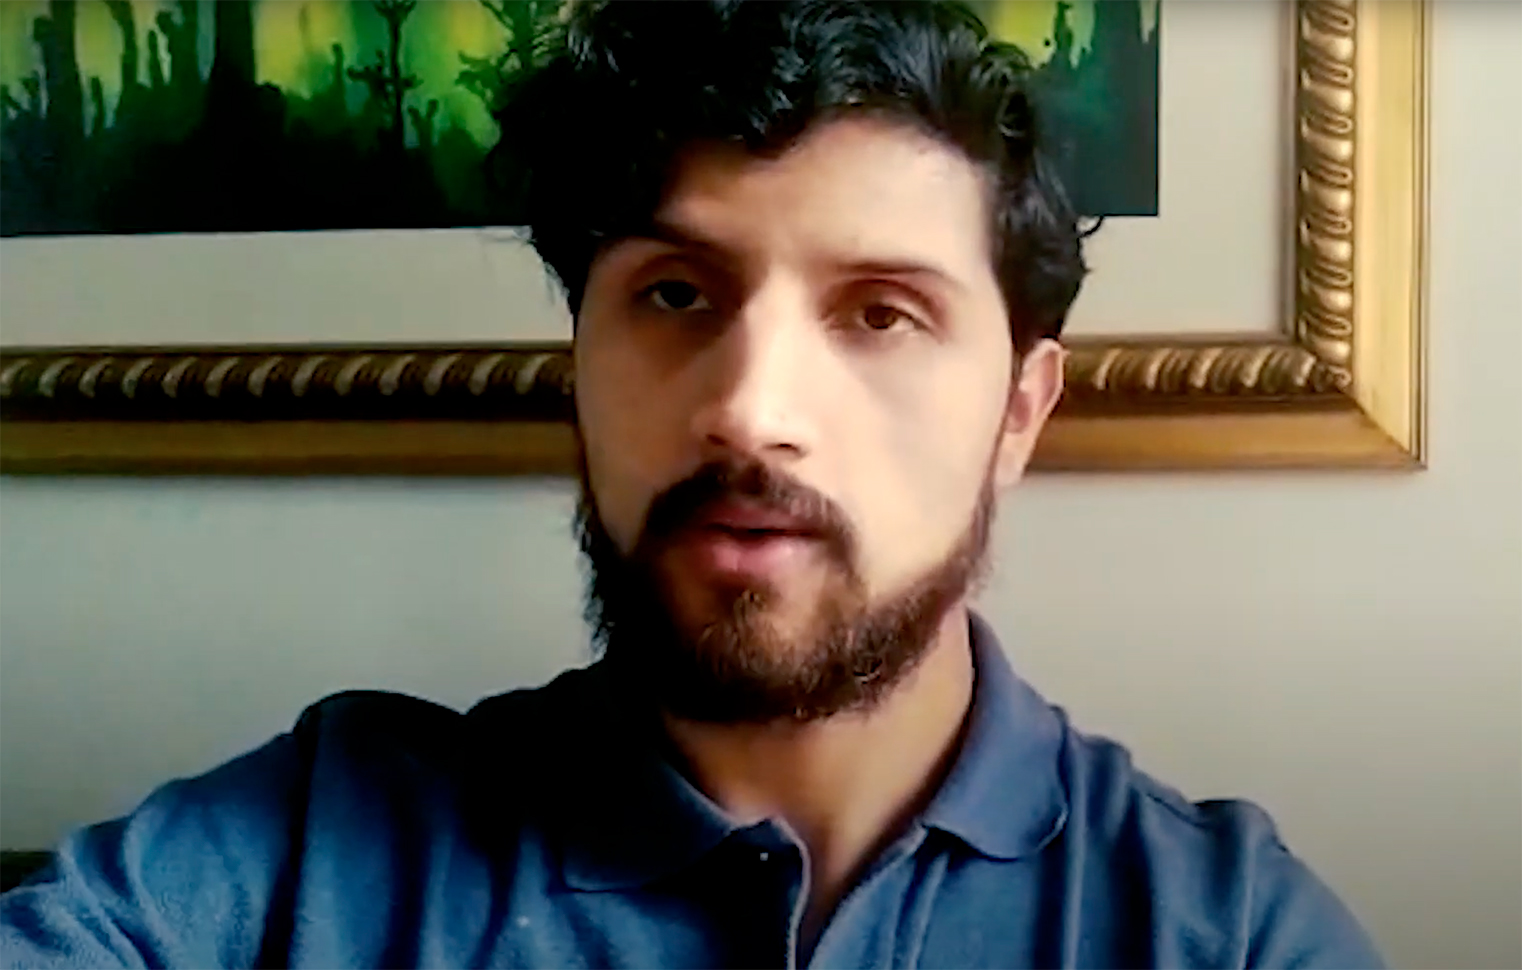 Uniandinos – Dosis cultural: Andrés Sereno, egresado de Música